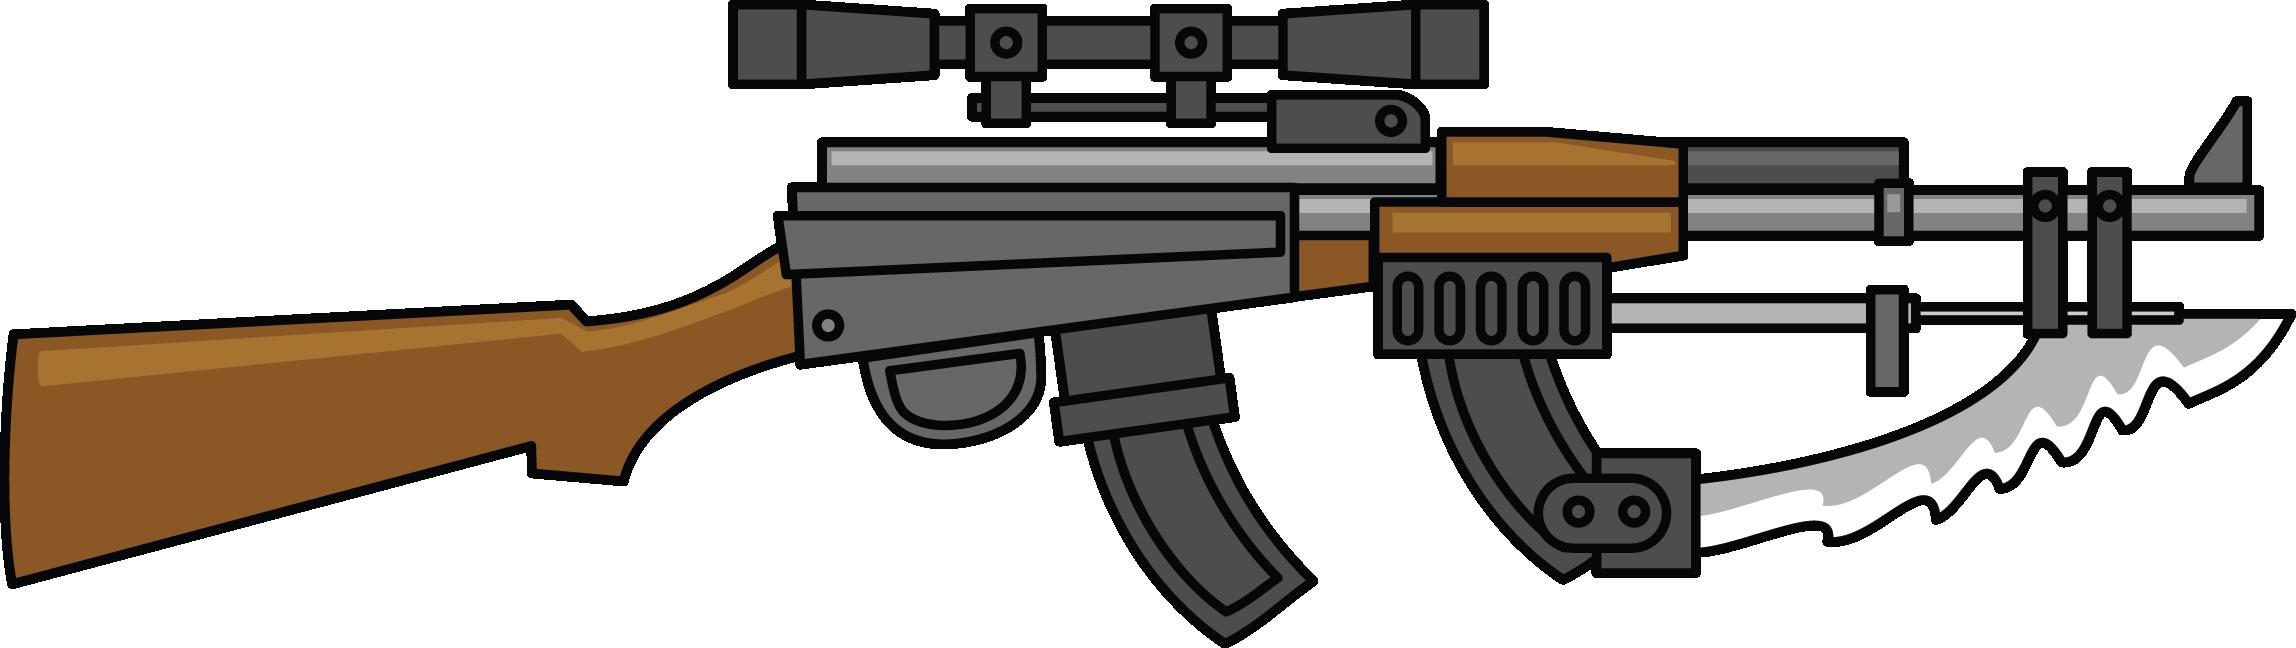 2296x648 Free To Use Amp Public Domain Guns Clip Art